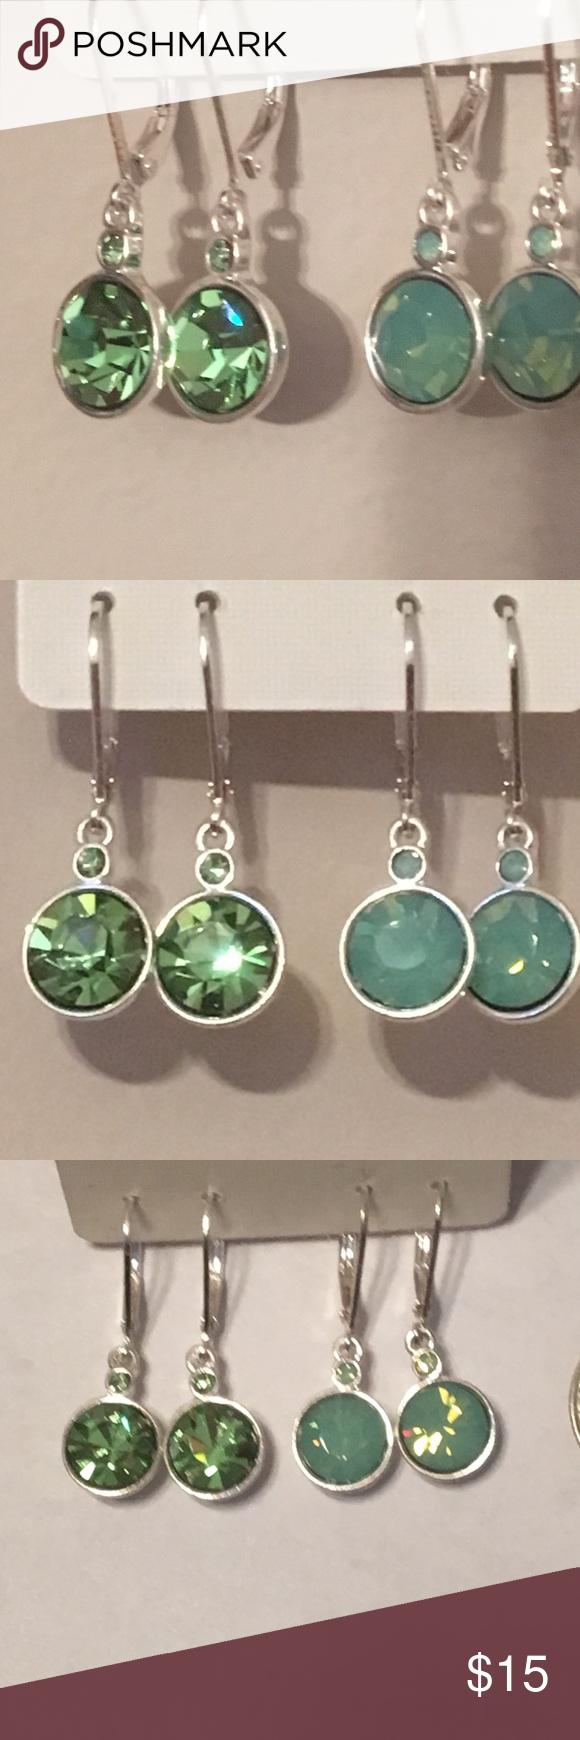 2 Pairs of SWAROVSKI filled earrings 2 beautiful green toned ...